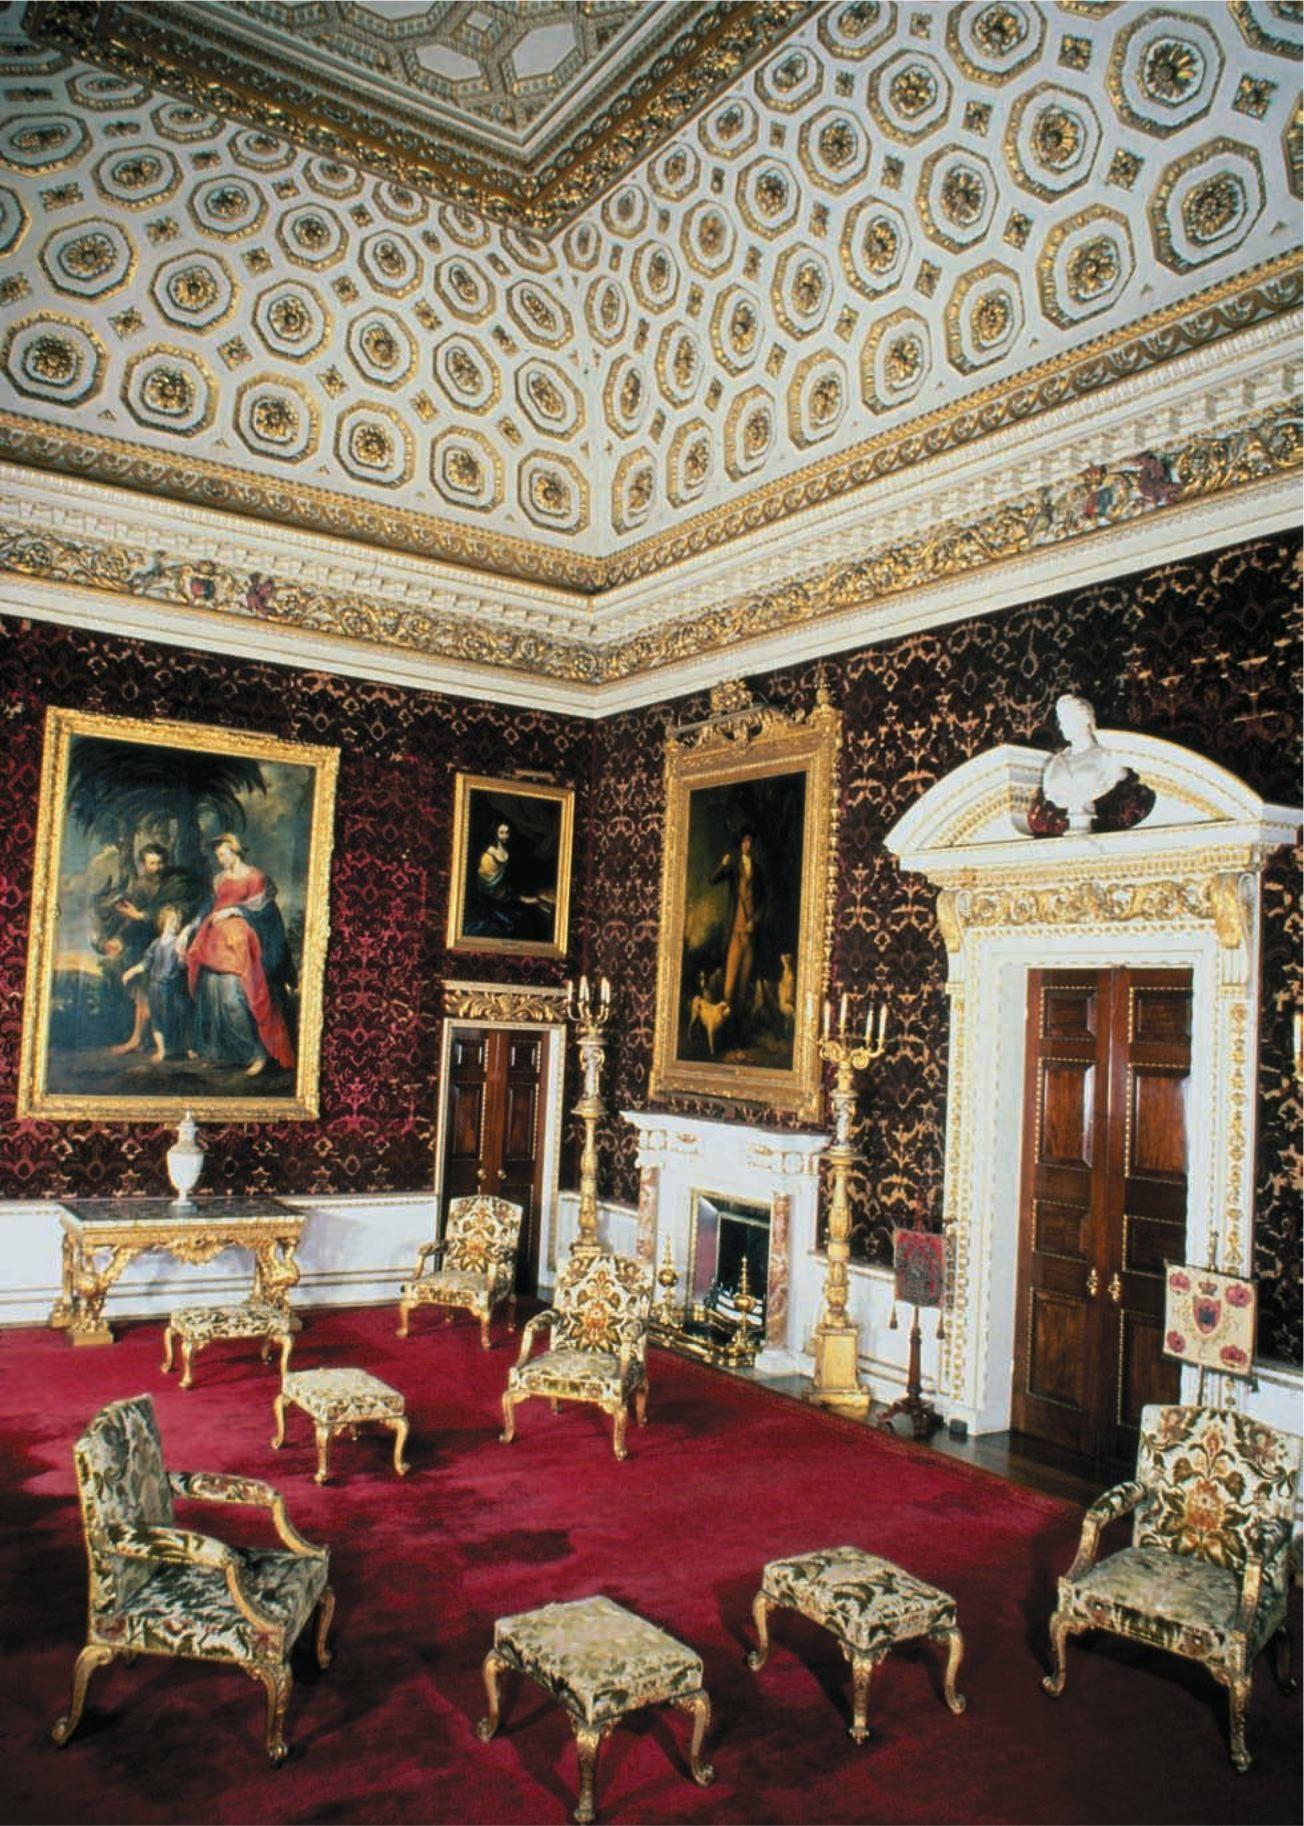 Holkam hall saloon begun 1734 norfolk england william kent